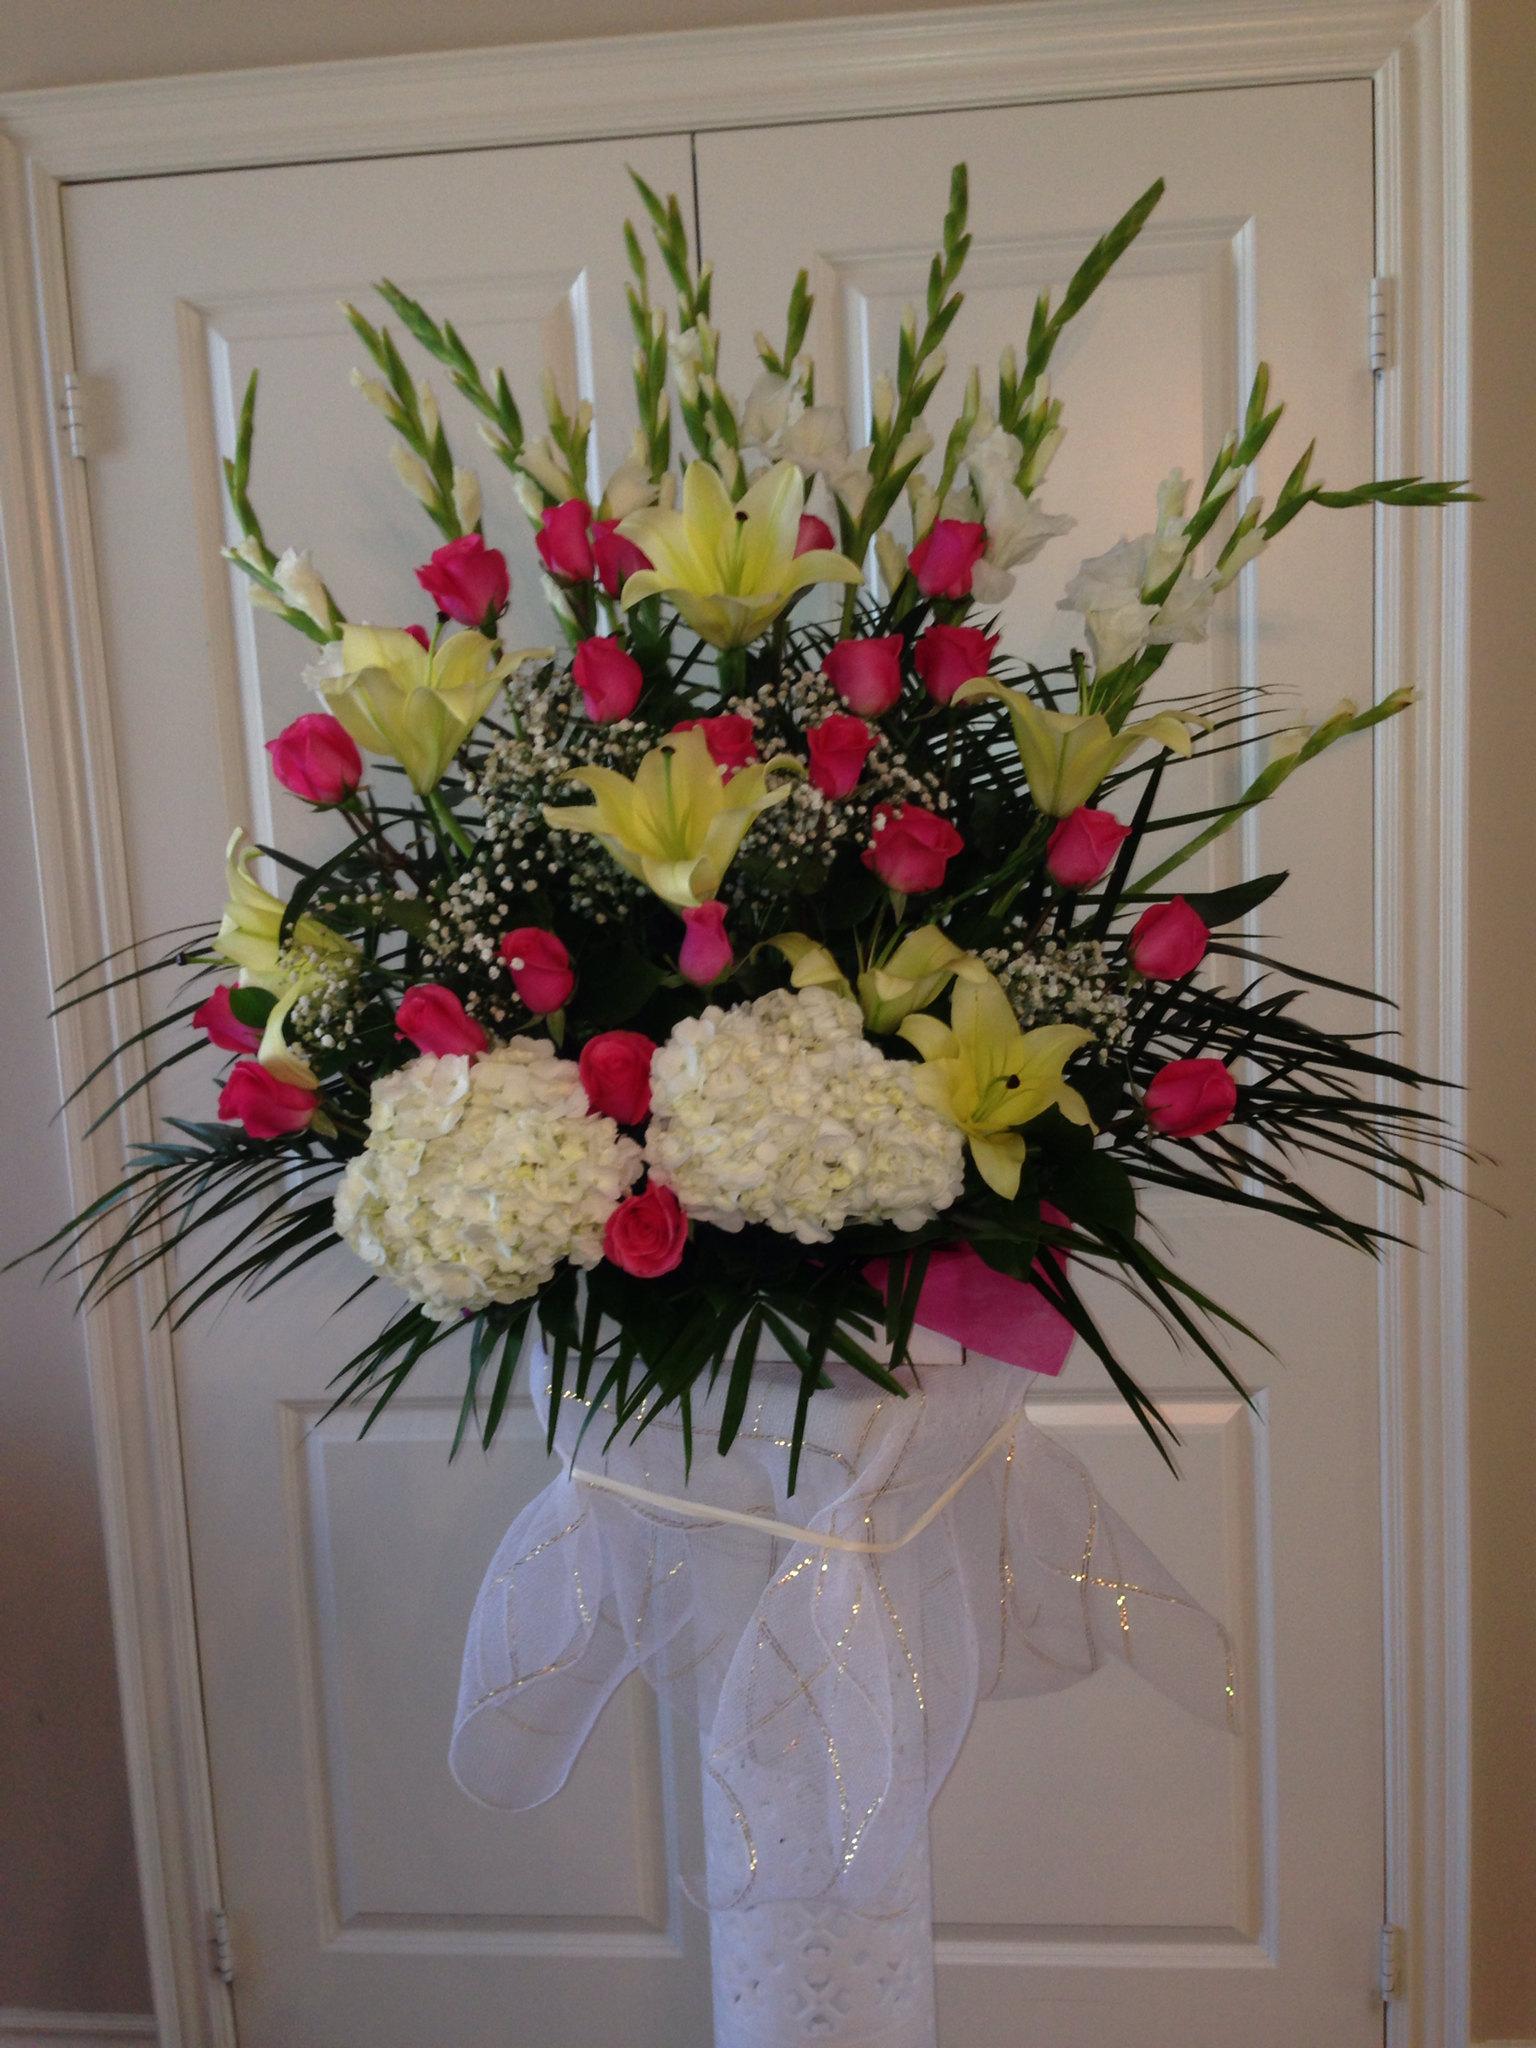 Farah florist. W-A03. $130